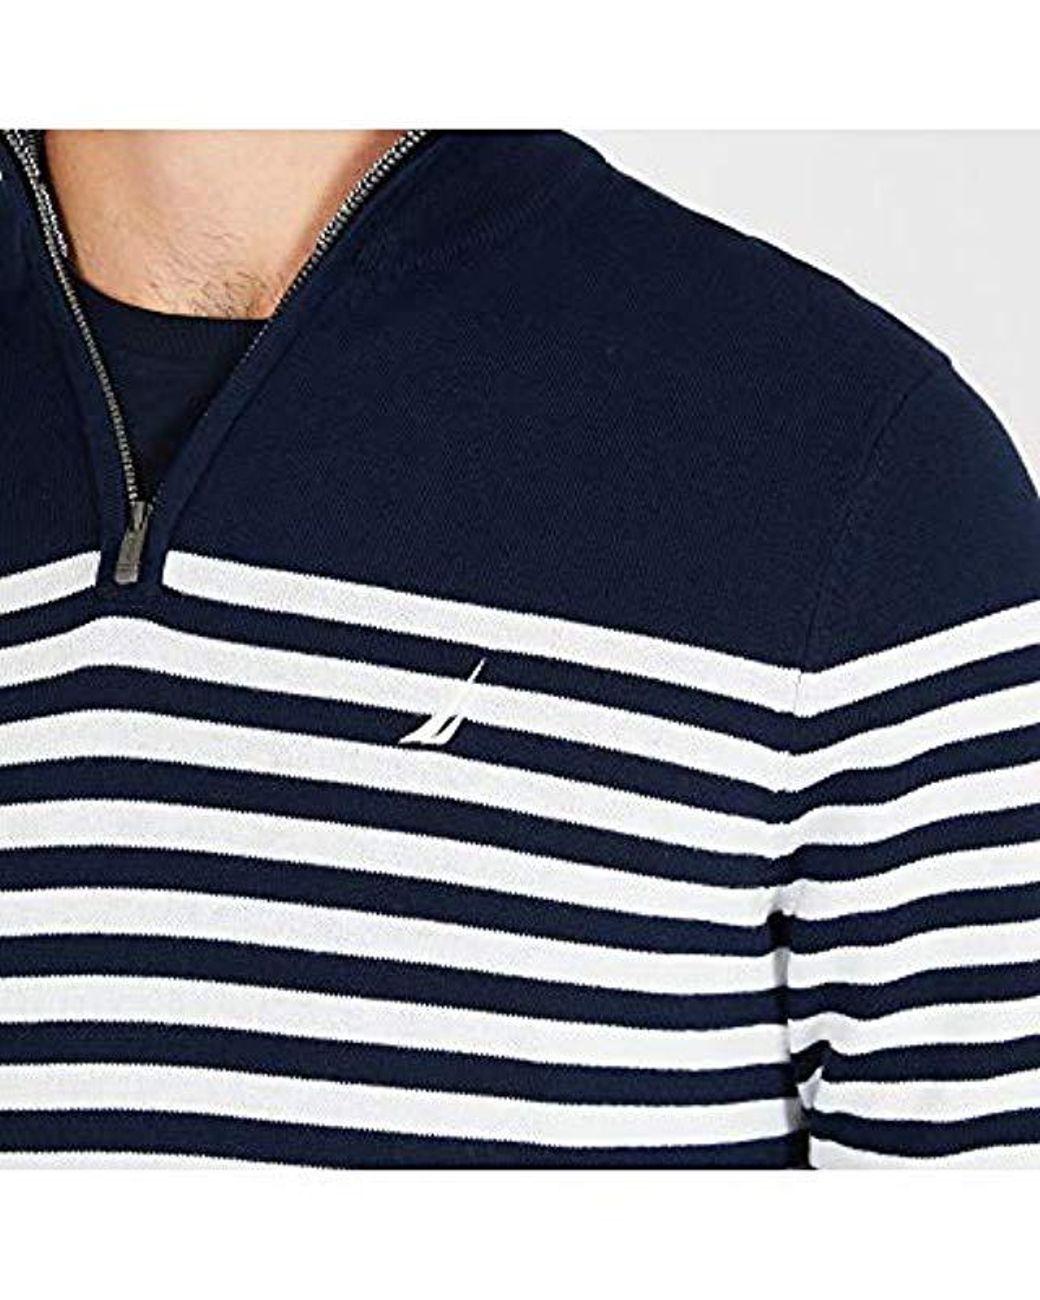 5d635c56b08 Men's Blue Long Sleeve 1/4 Zip Sweater